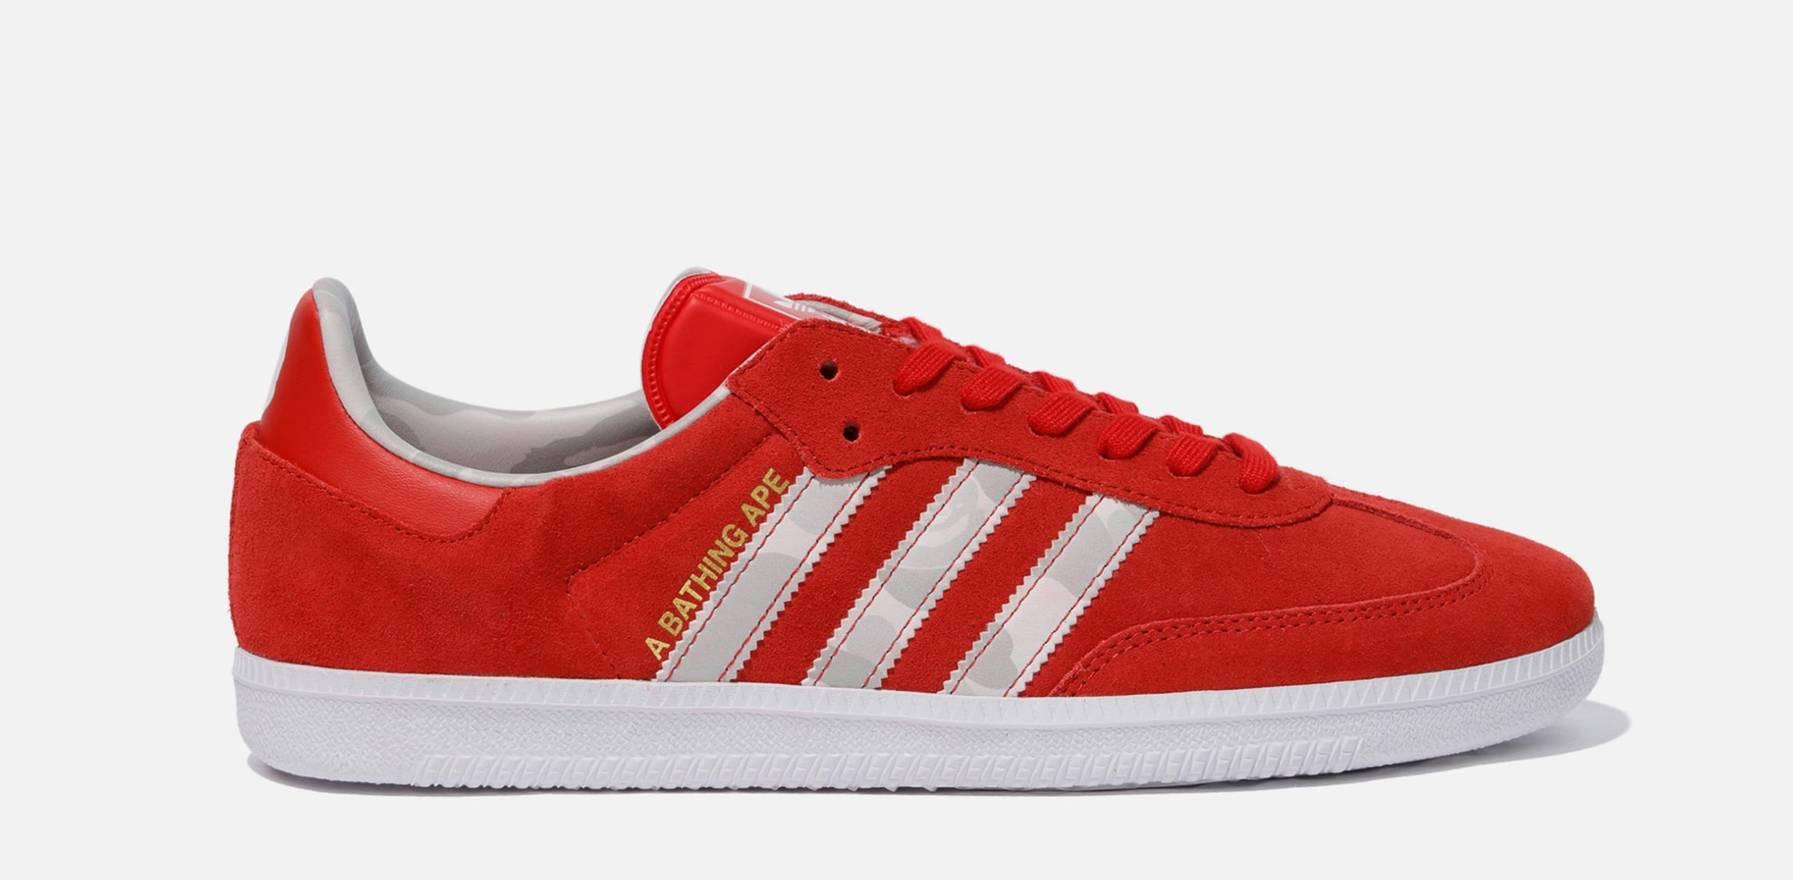 ireland adidas bape x adidas samba size us 9 eu 42 74927 aa9ce 153181f99